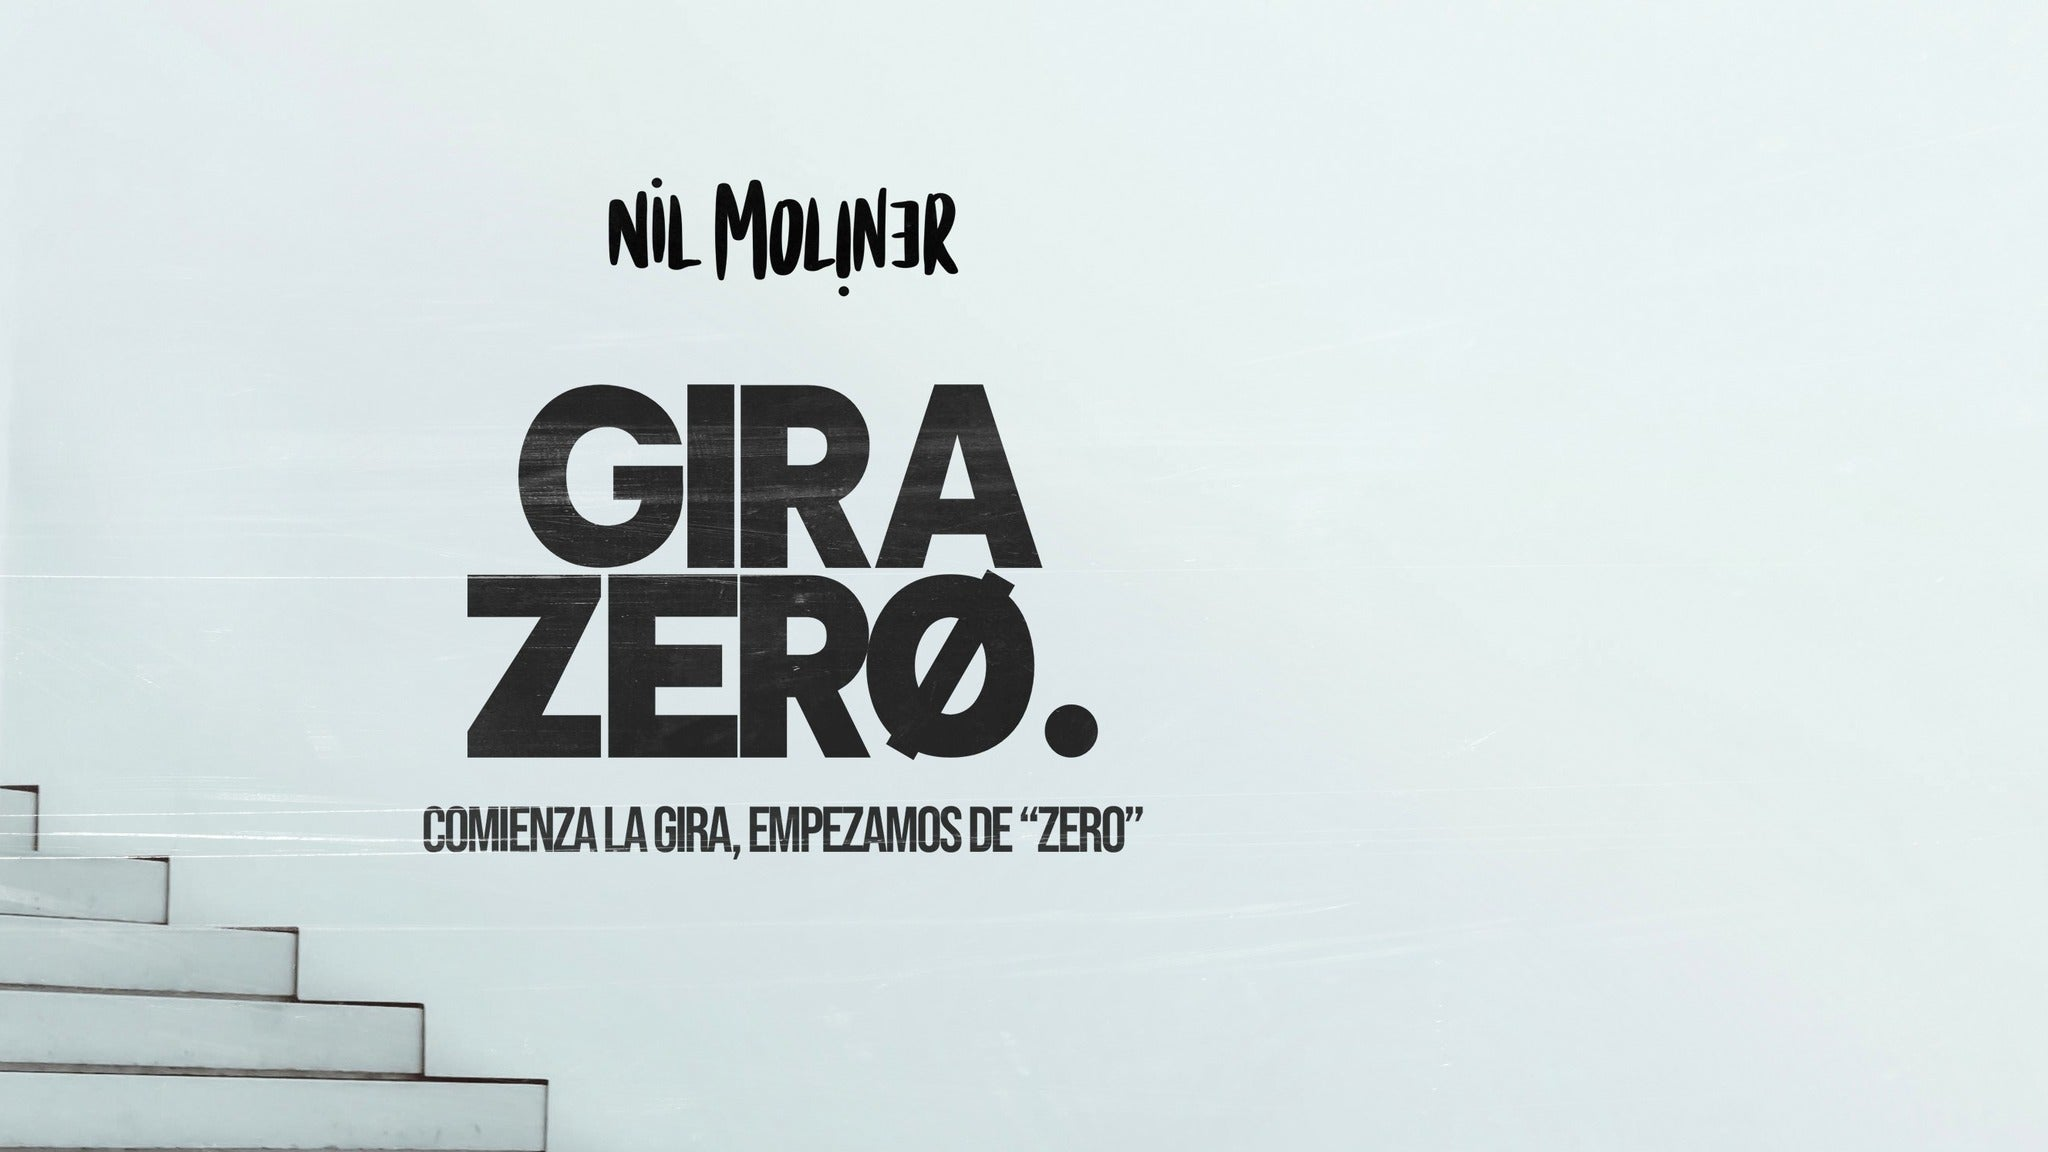 Nil Moliner, Dani Fernández & Pol Granch